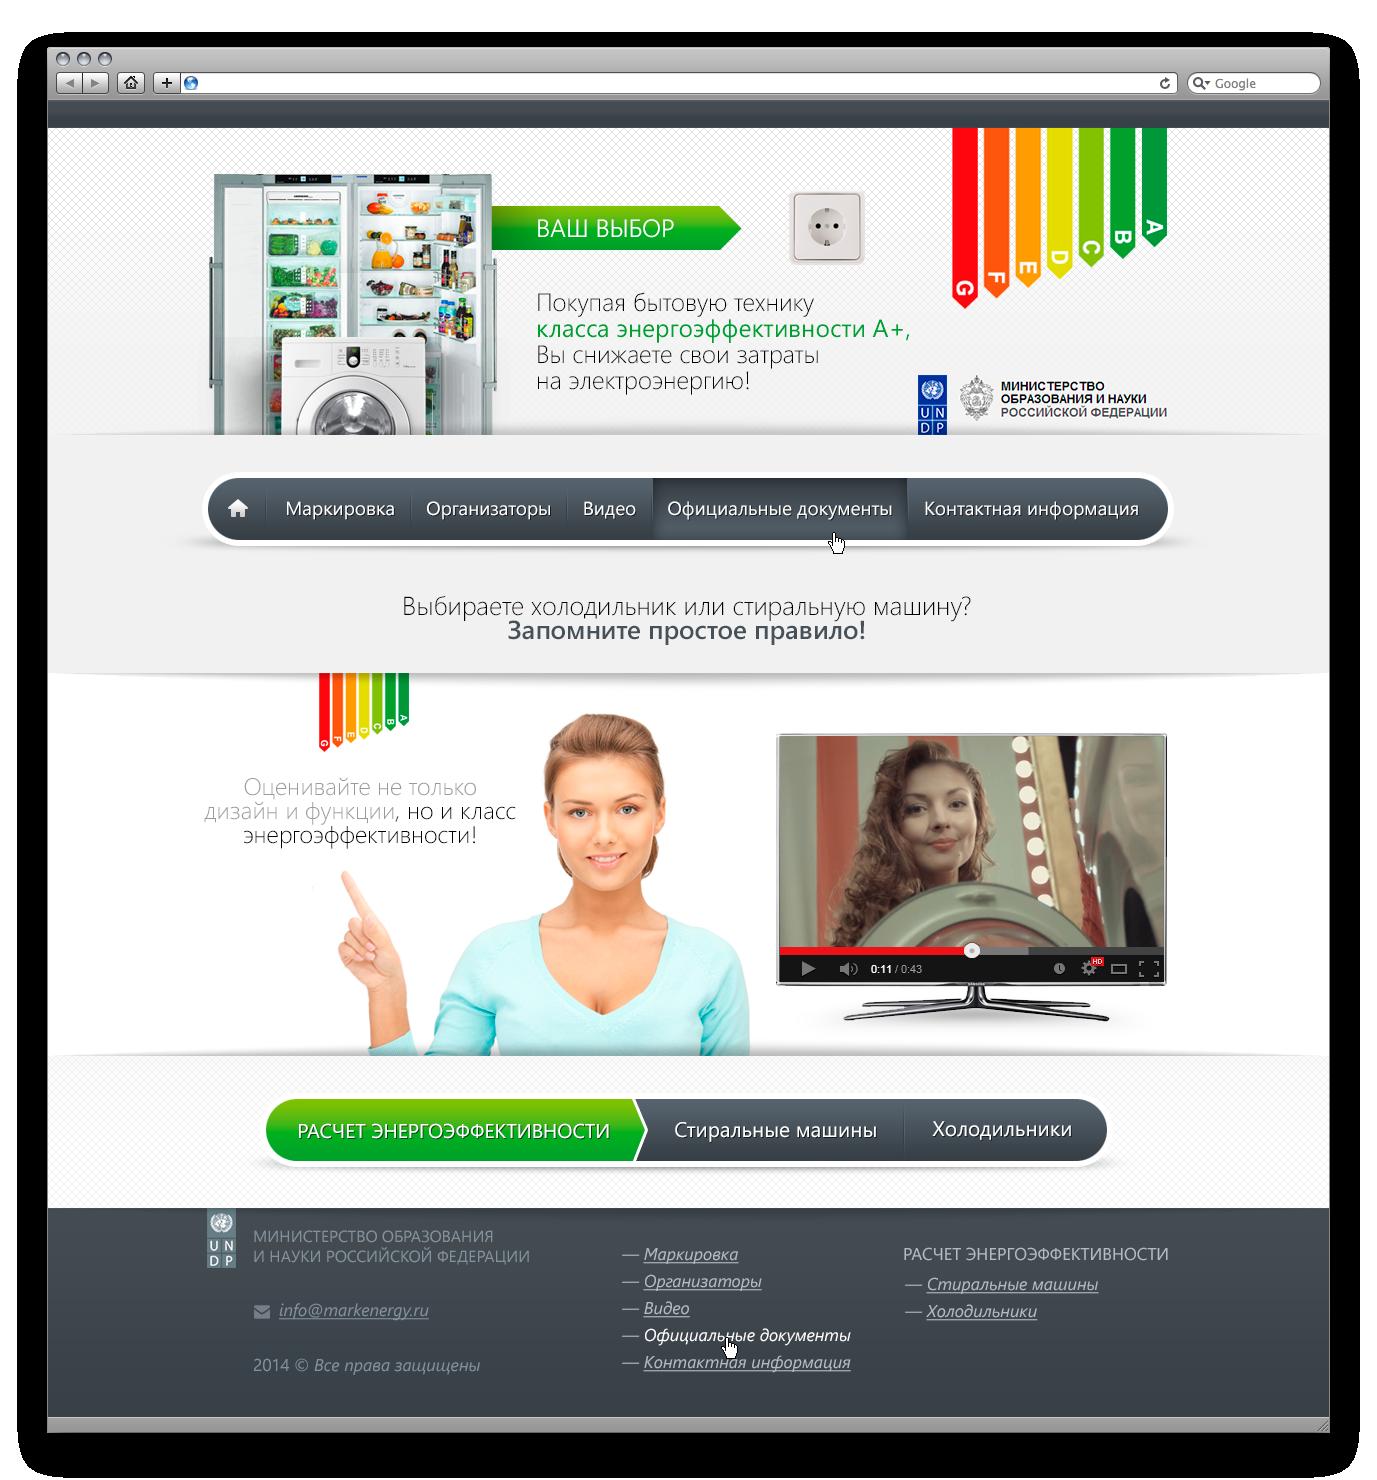 Дизайн и разработка промо-сайта. Программа развития ООН совместно с Министерством Образования и Науки РФ.